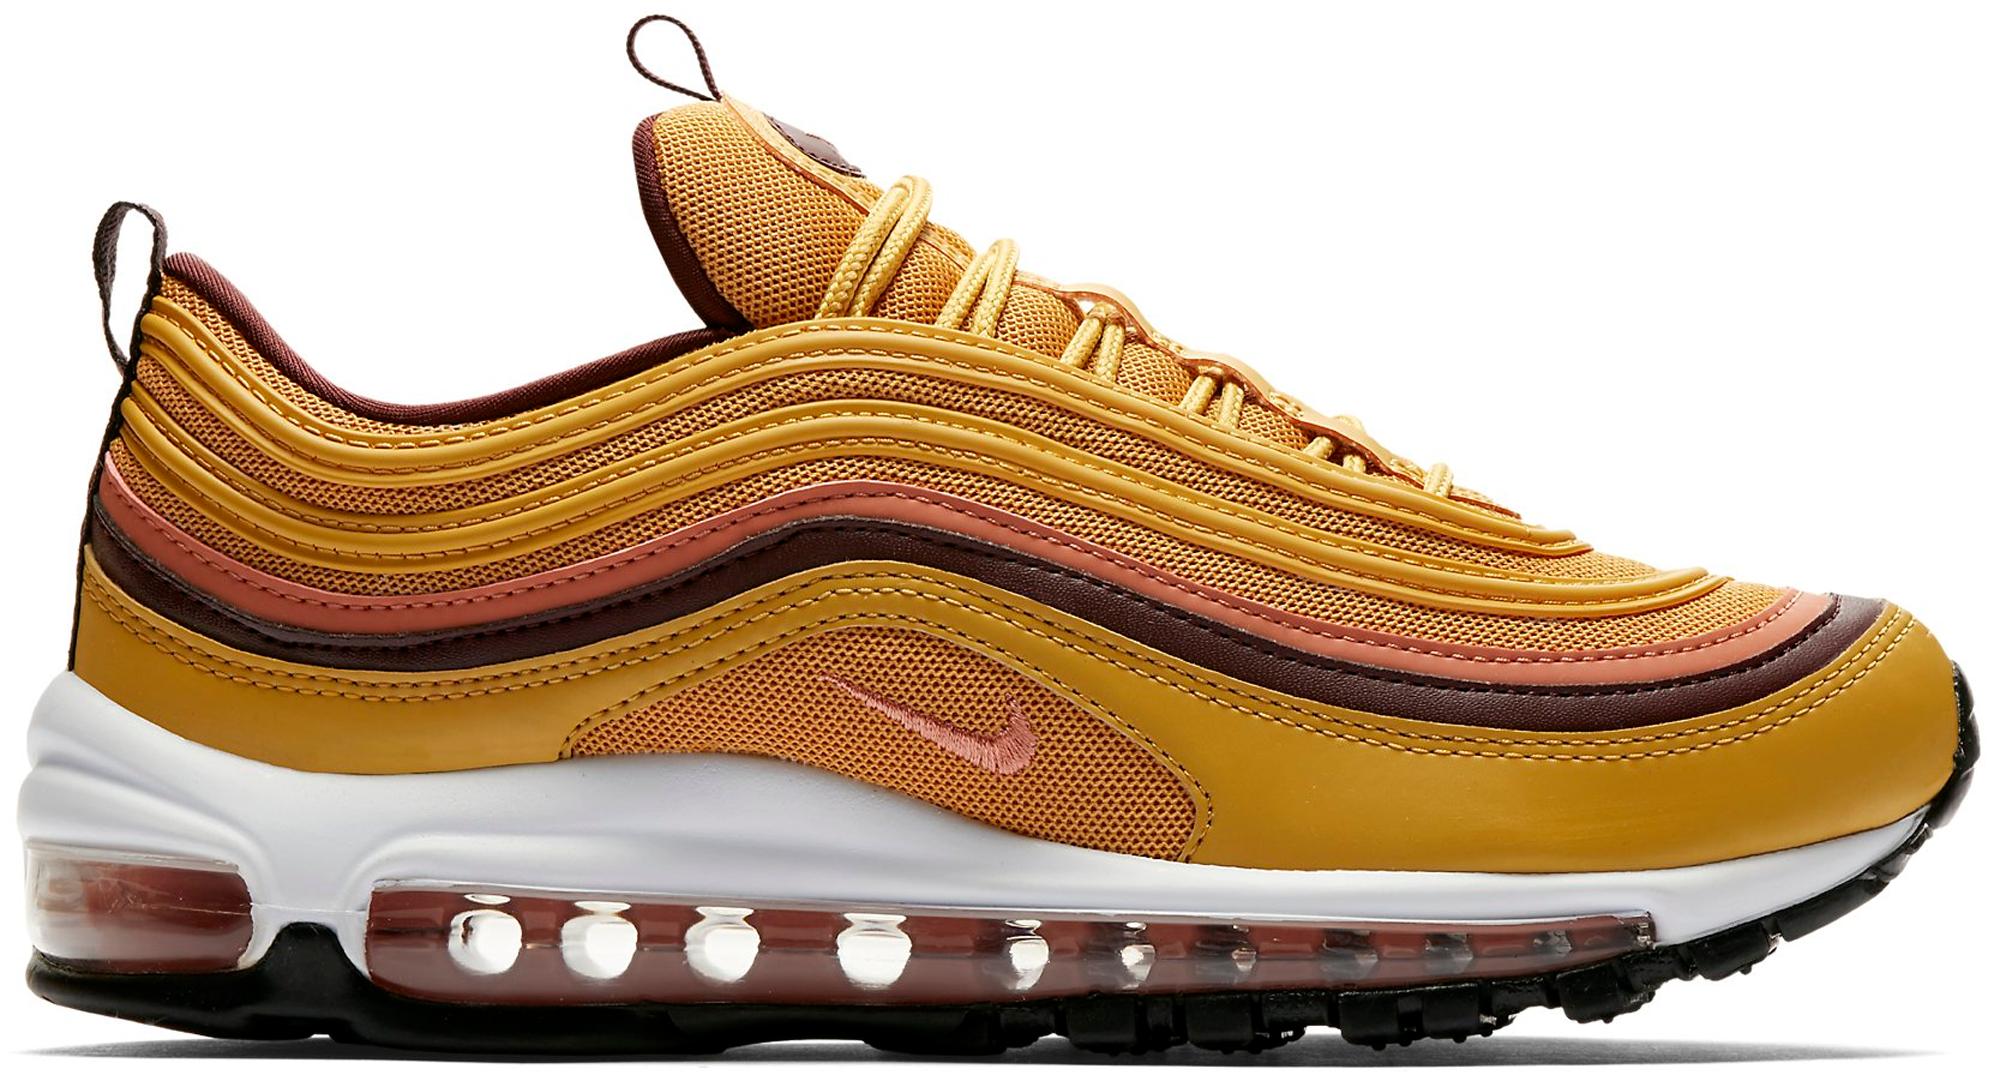 Nike Air Max 97 Mustard (W) - 921733-700